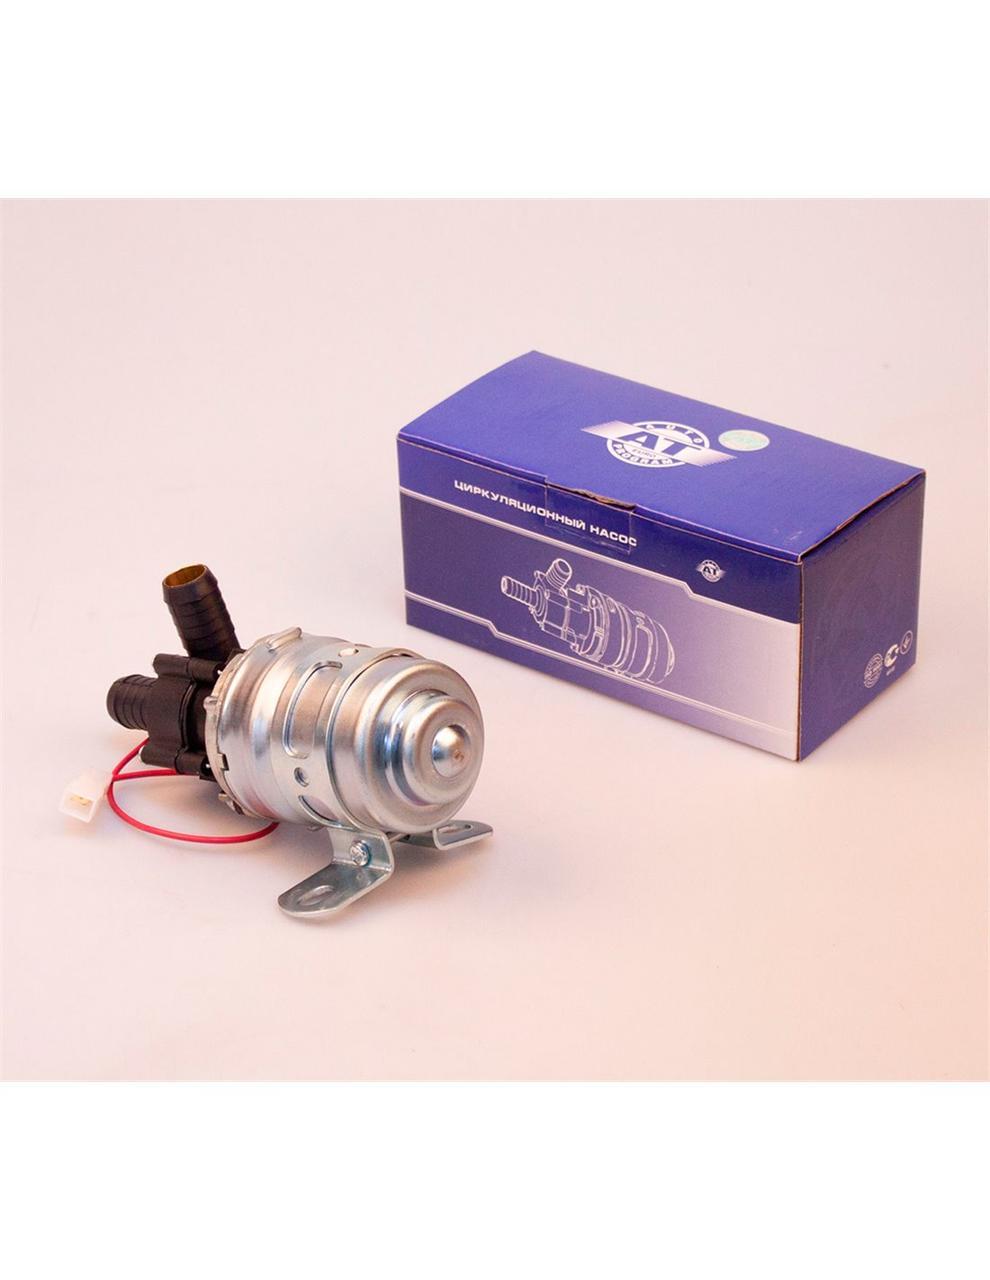 Насос ГАЗ-3110 циркуляционный сист.охлаж двиг (d=18 мм) (AT 0010-270WW) (AT)